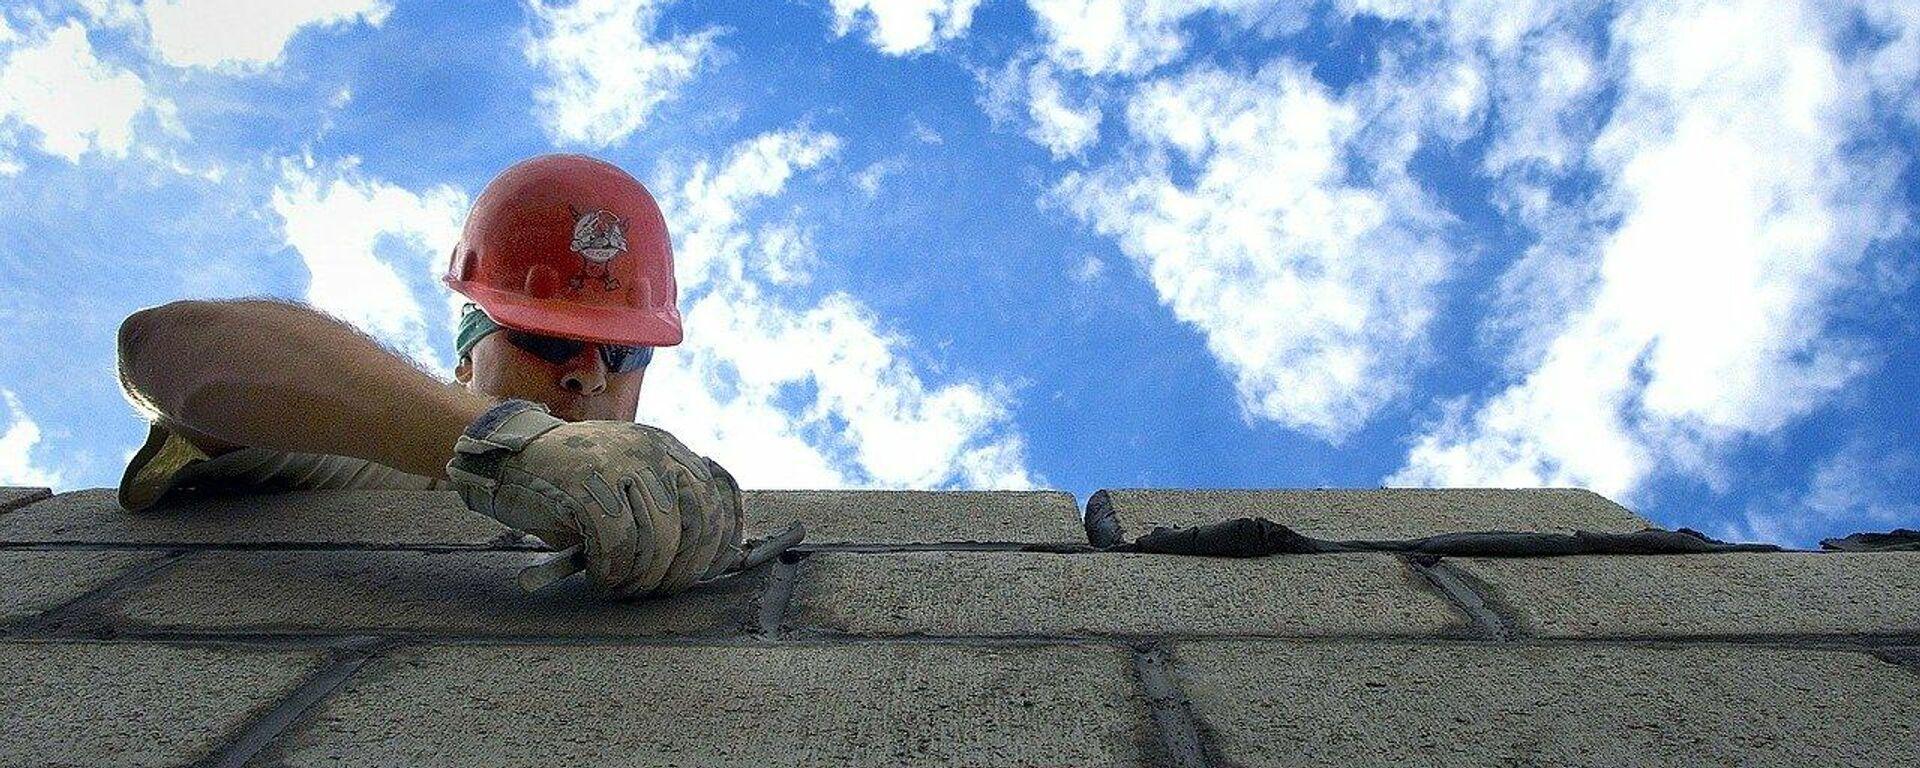 Bauarbeiter (Symbolbild) - SNA, 1920, 07.10.2021